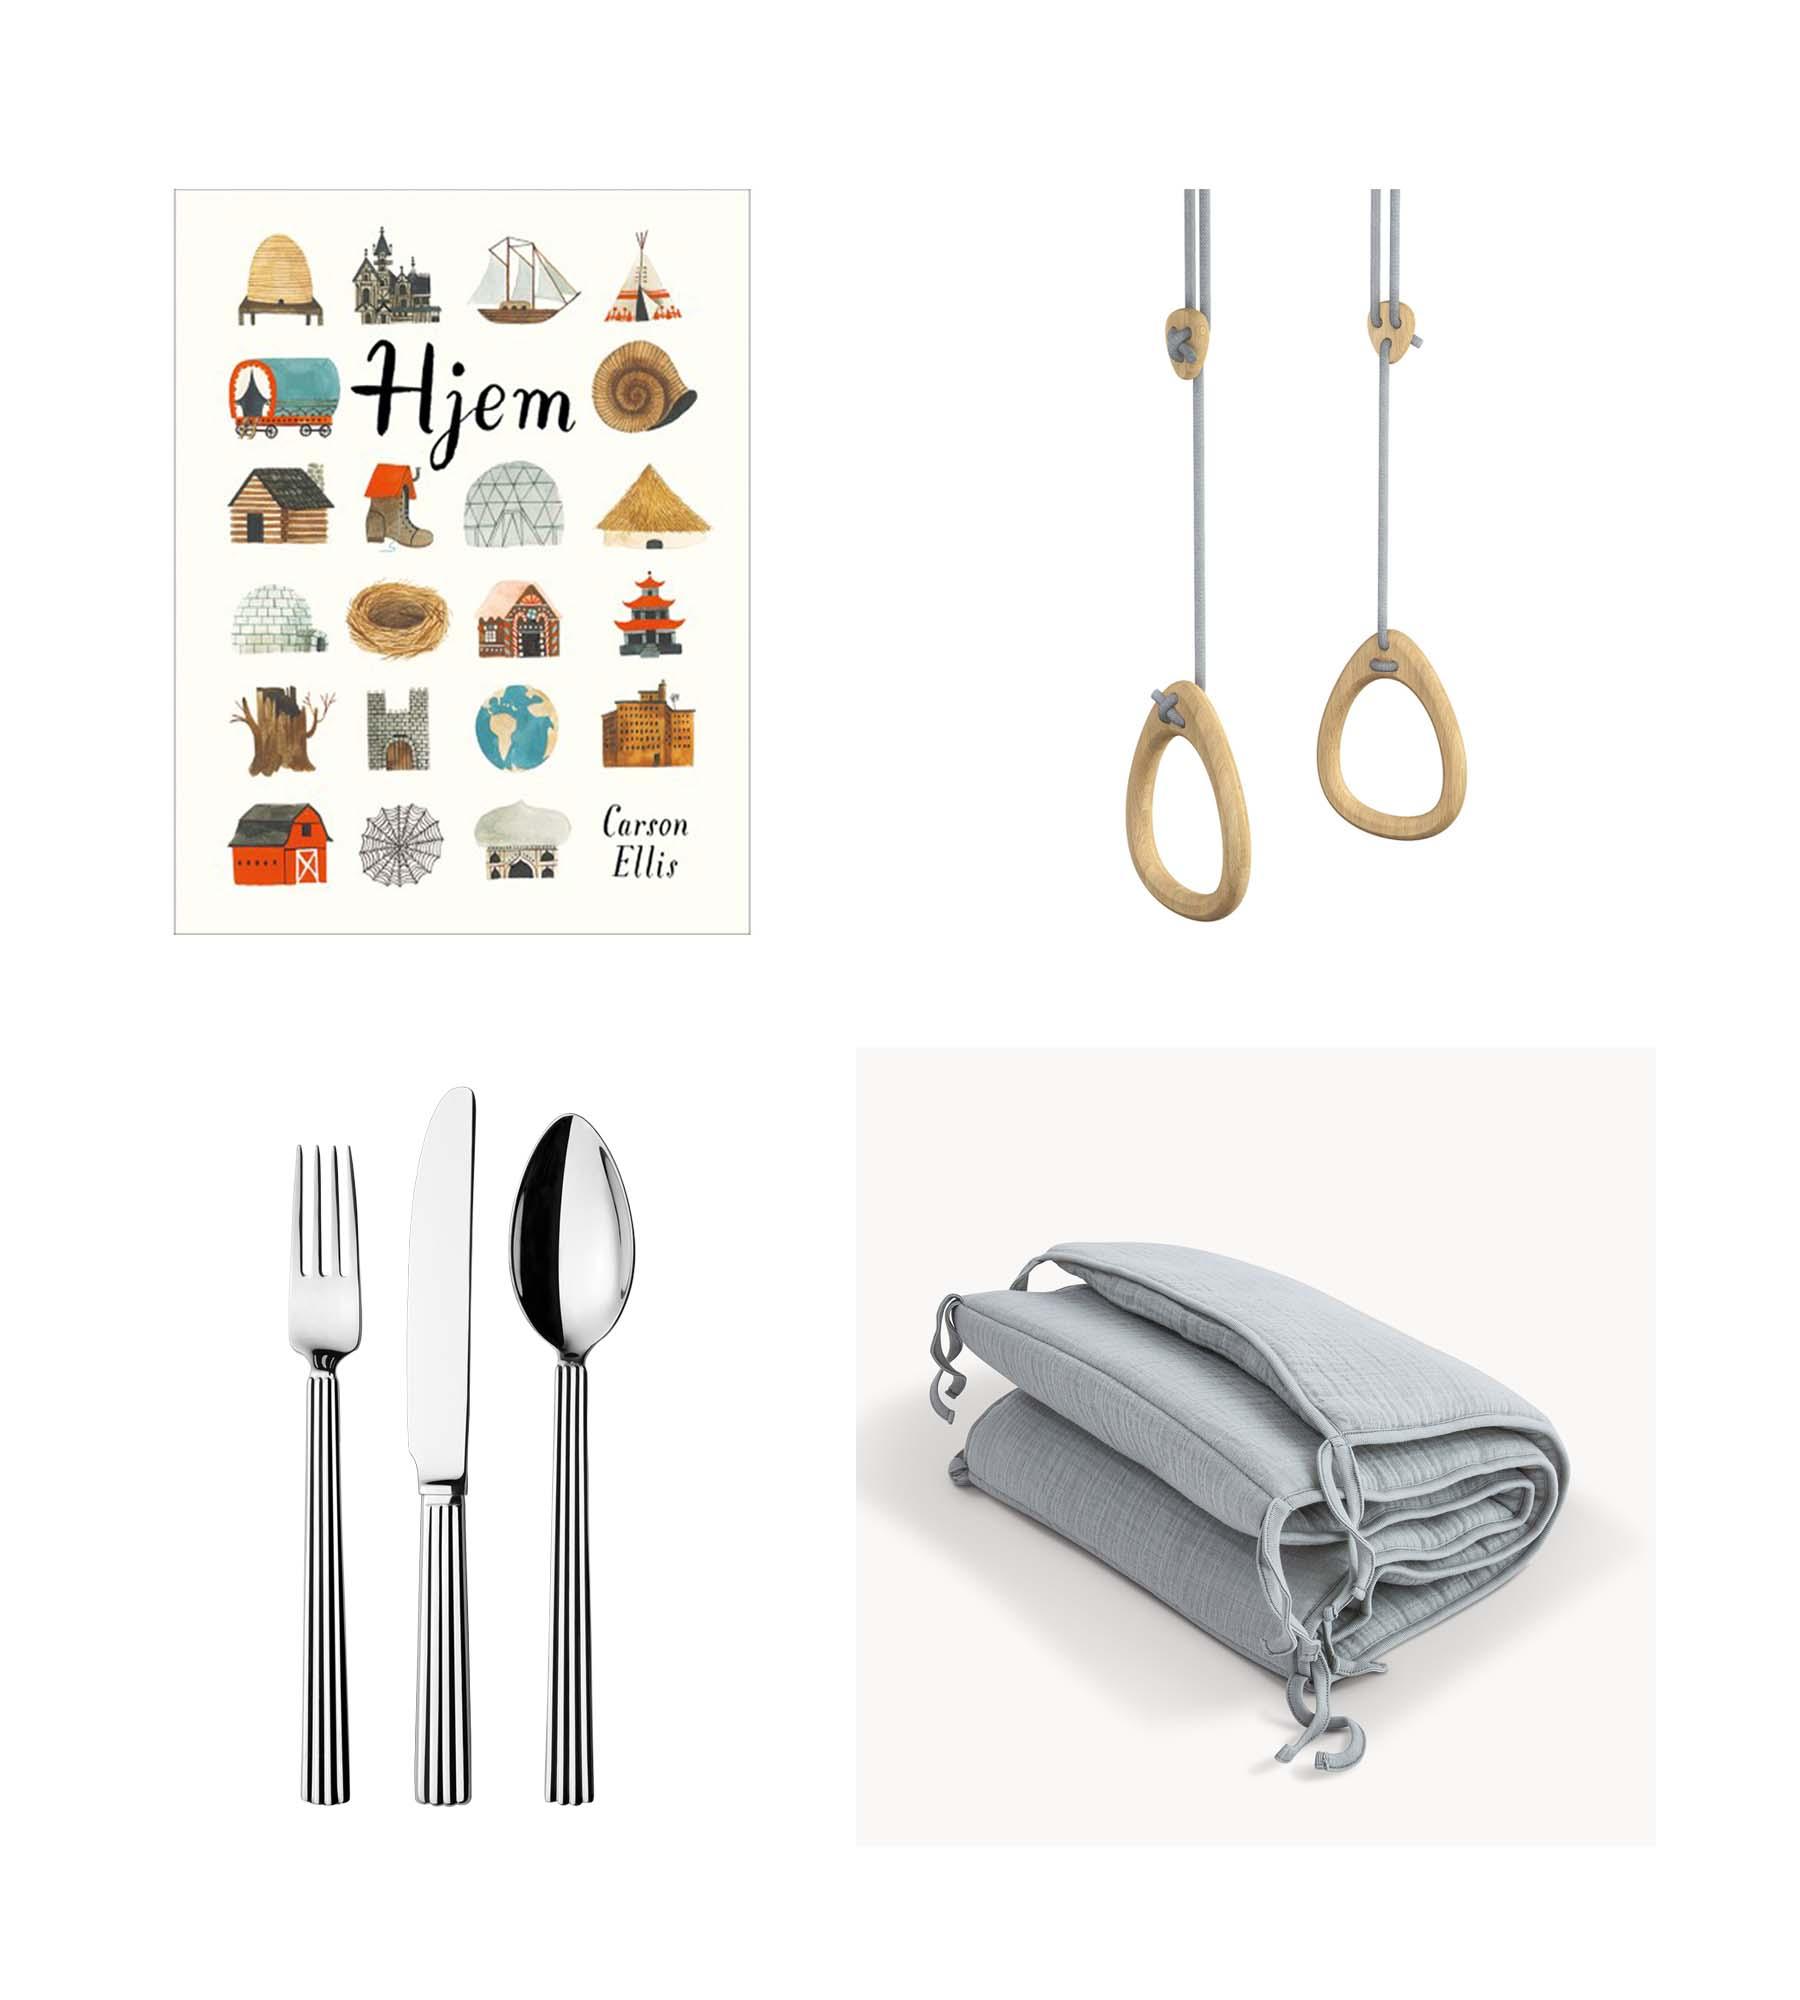 Book/ CARSON ELLIS: HJEM  Gymnastic rings/ LILLAGUNGA  Cutlery set/ GEORG JENSEN  Bed bumper/ MOUMOUT